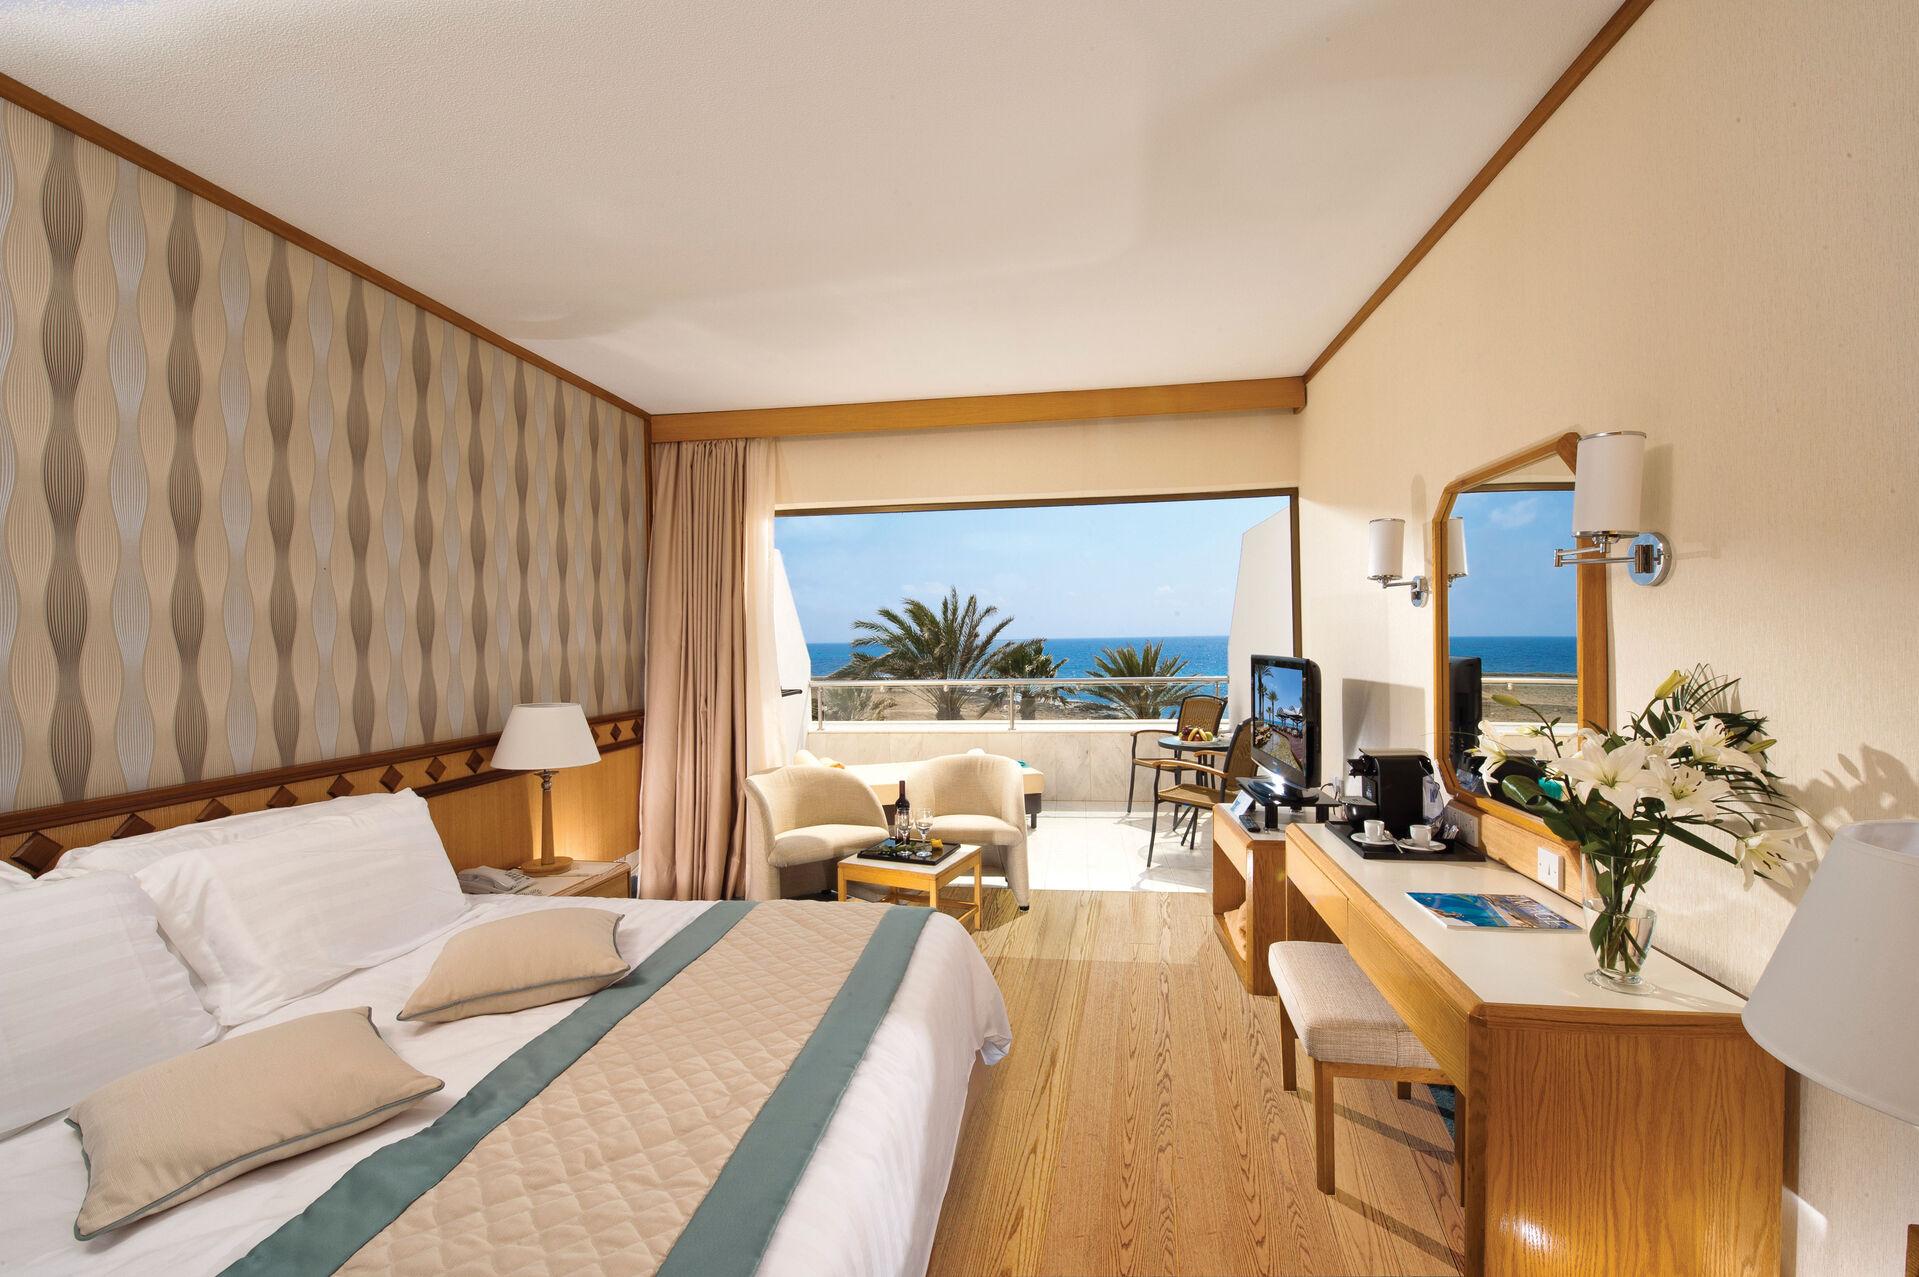 https://cms.satur.sk/data/imgs/tour_image/orig/23-pioneer-beach-hotel-superior-deluxe-room-sv-1972644.jpg